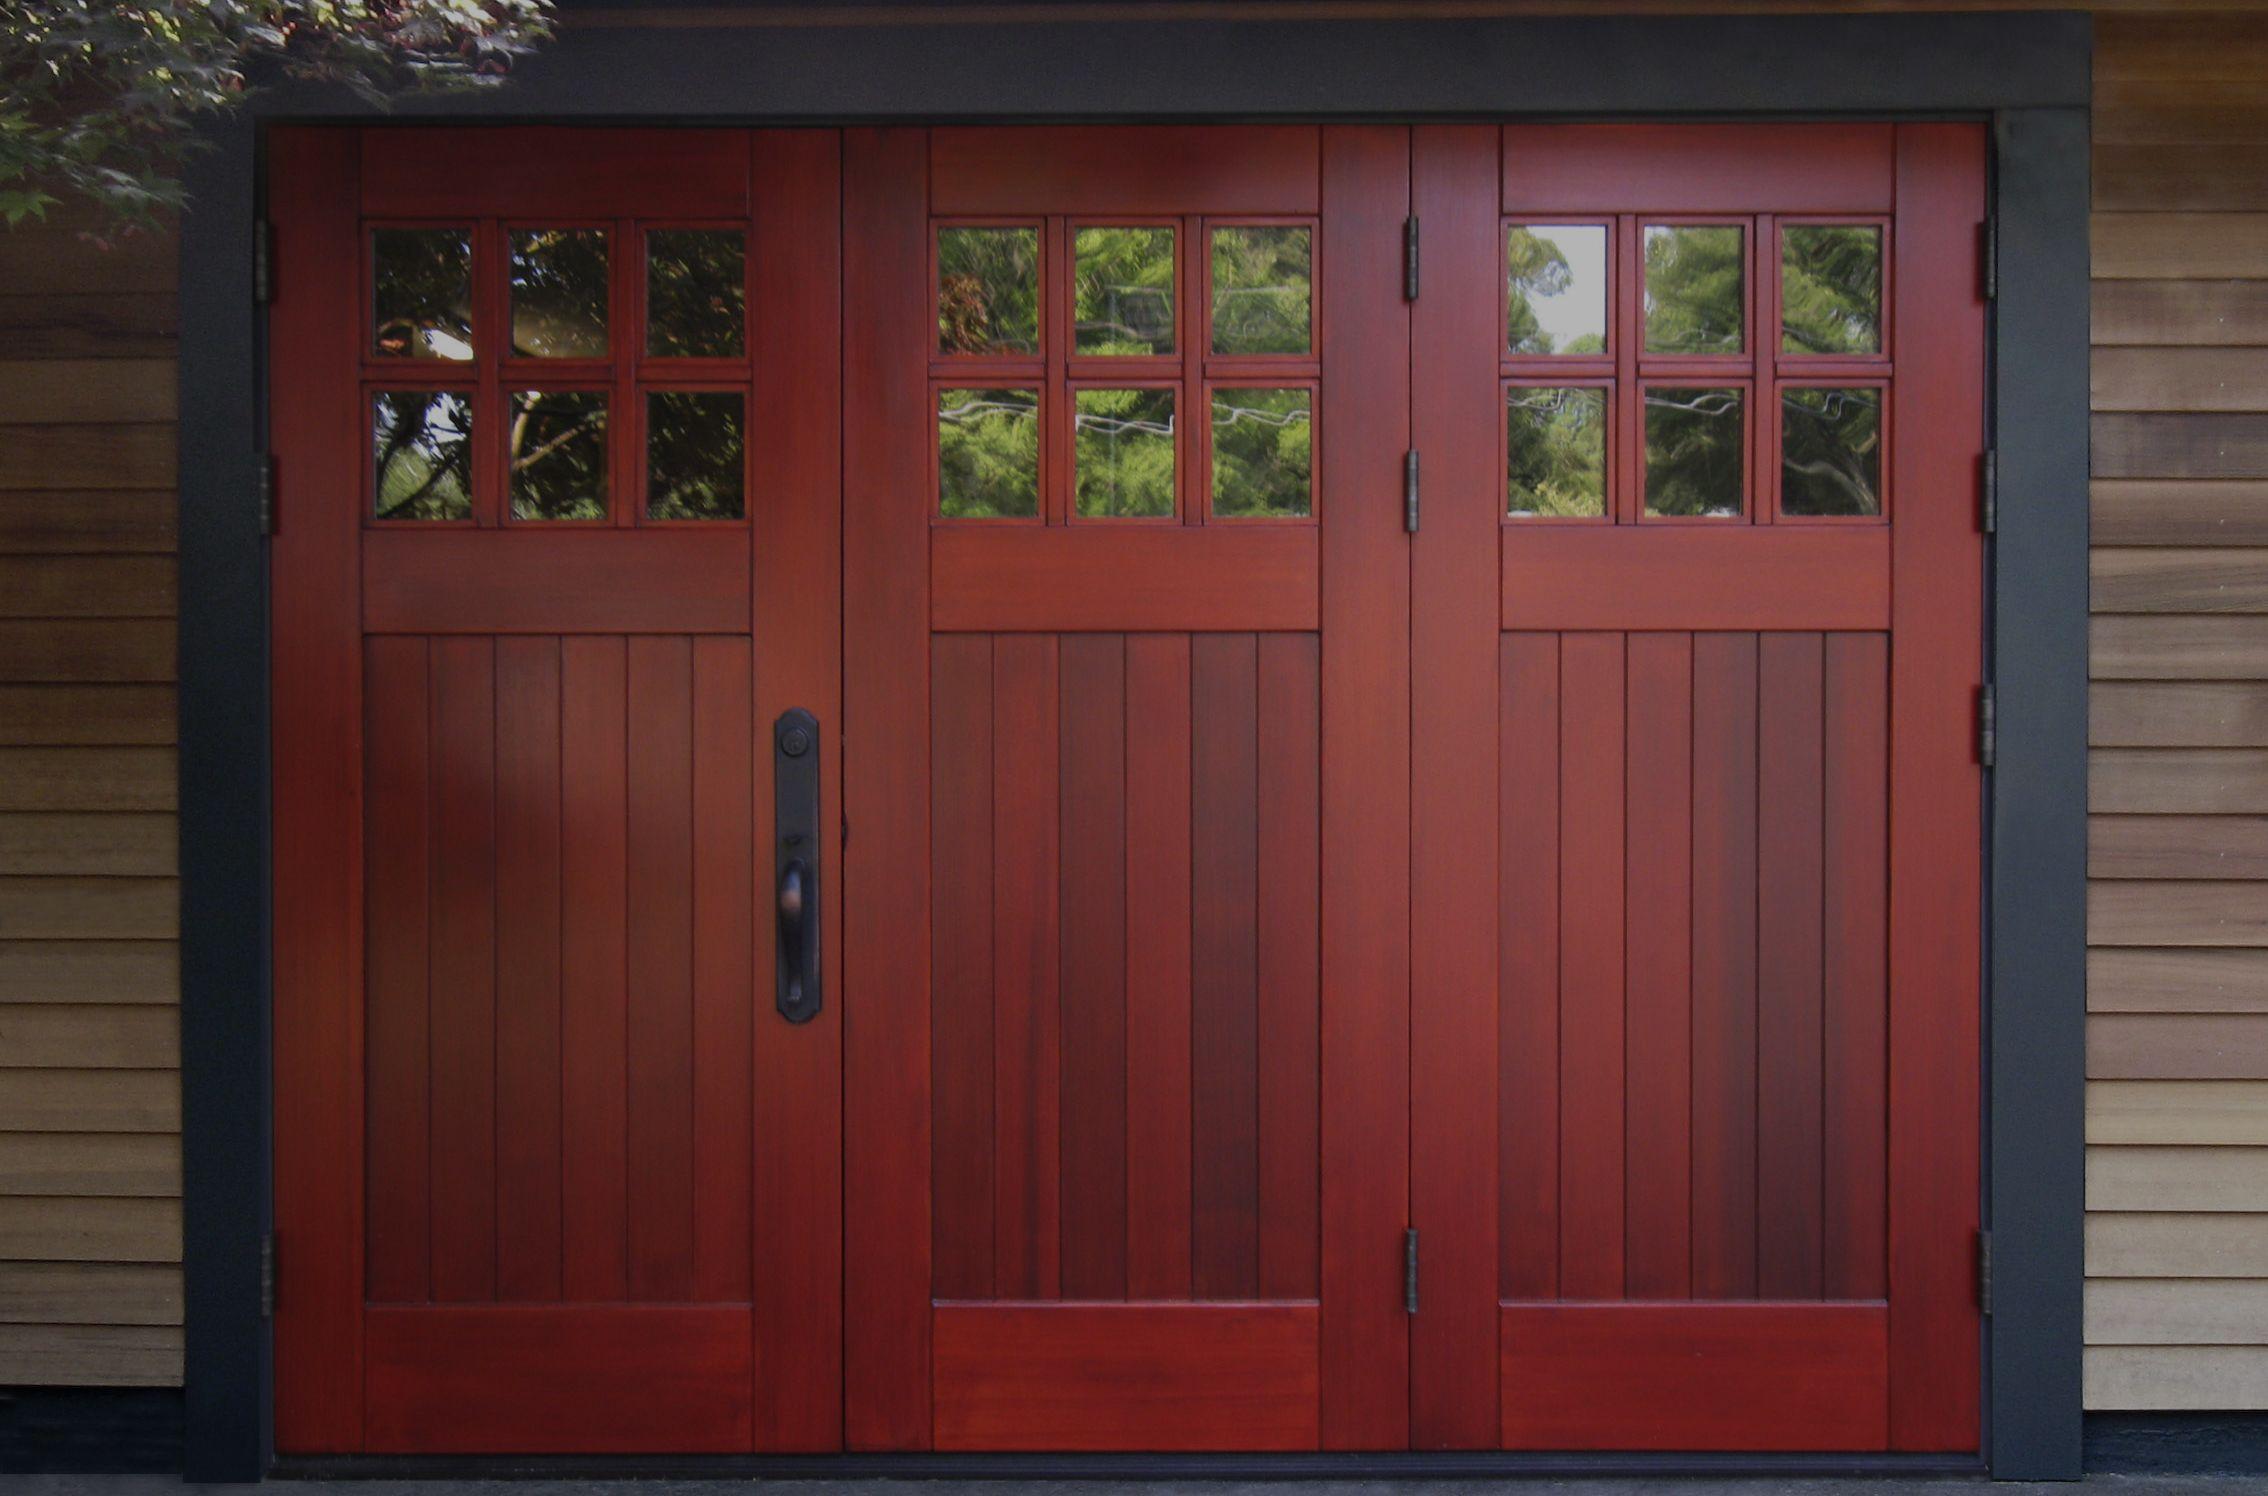 Folding Doors From Real Carriage Door Sliding Hardware Garage Doors Red Garage Door Carriage Doors